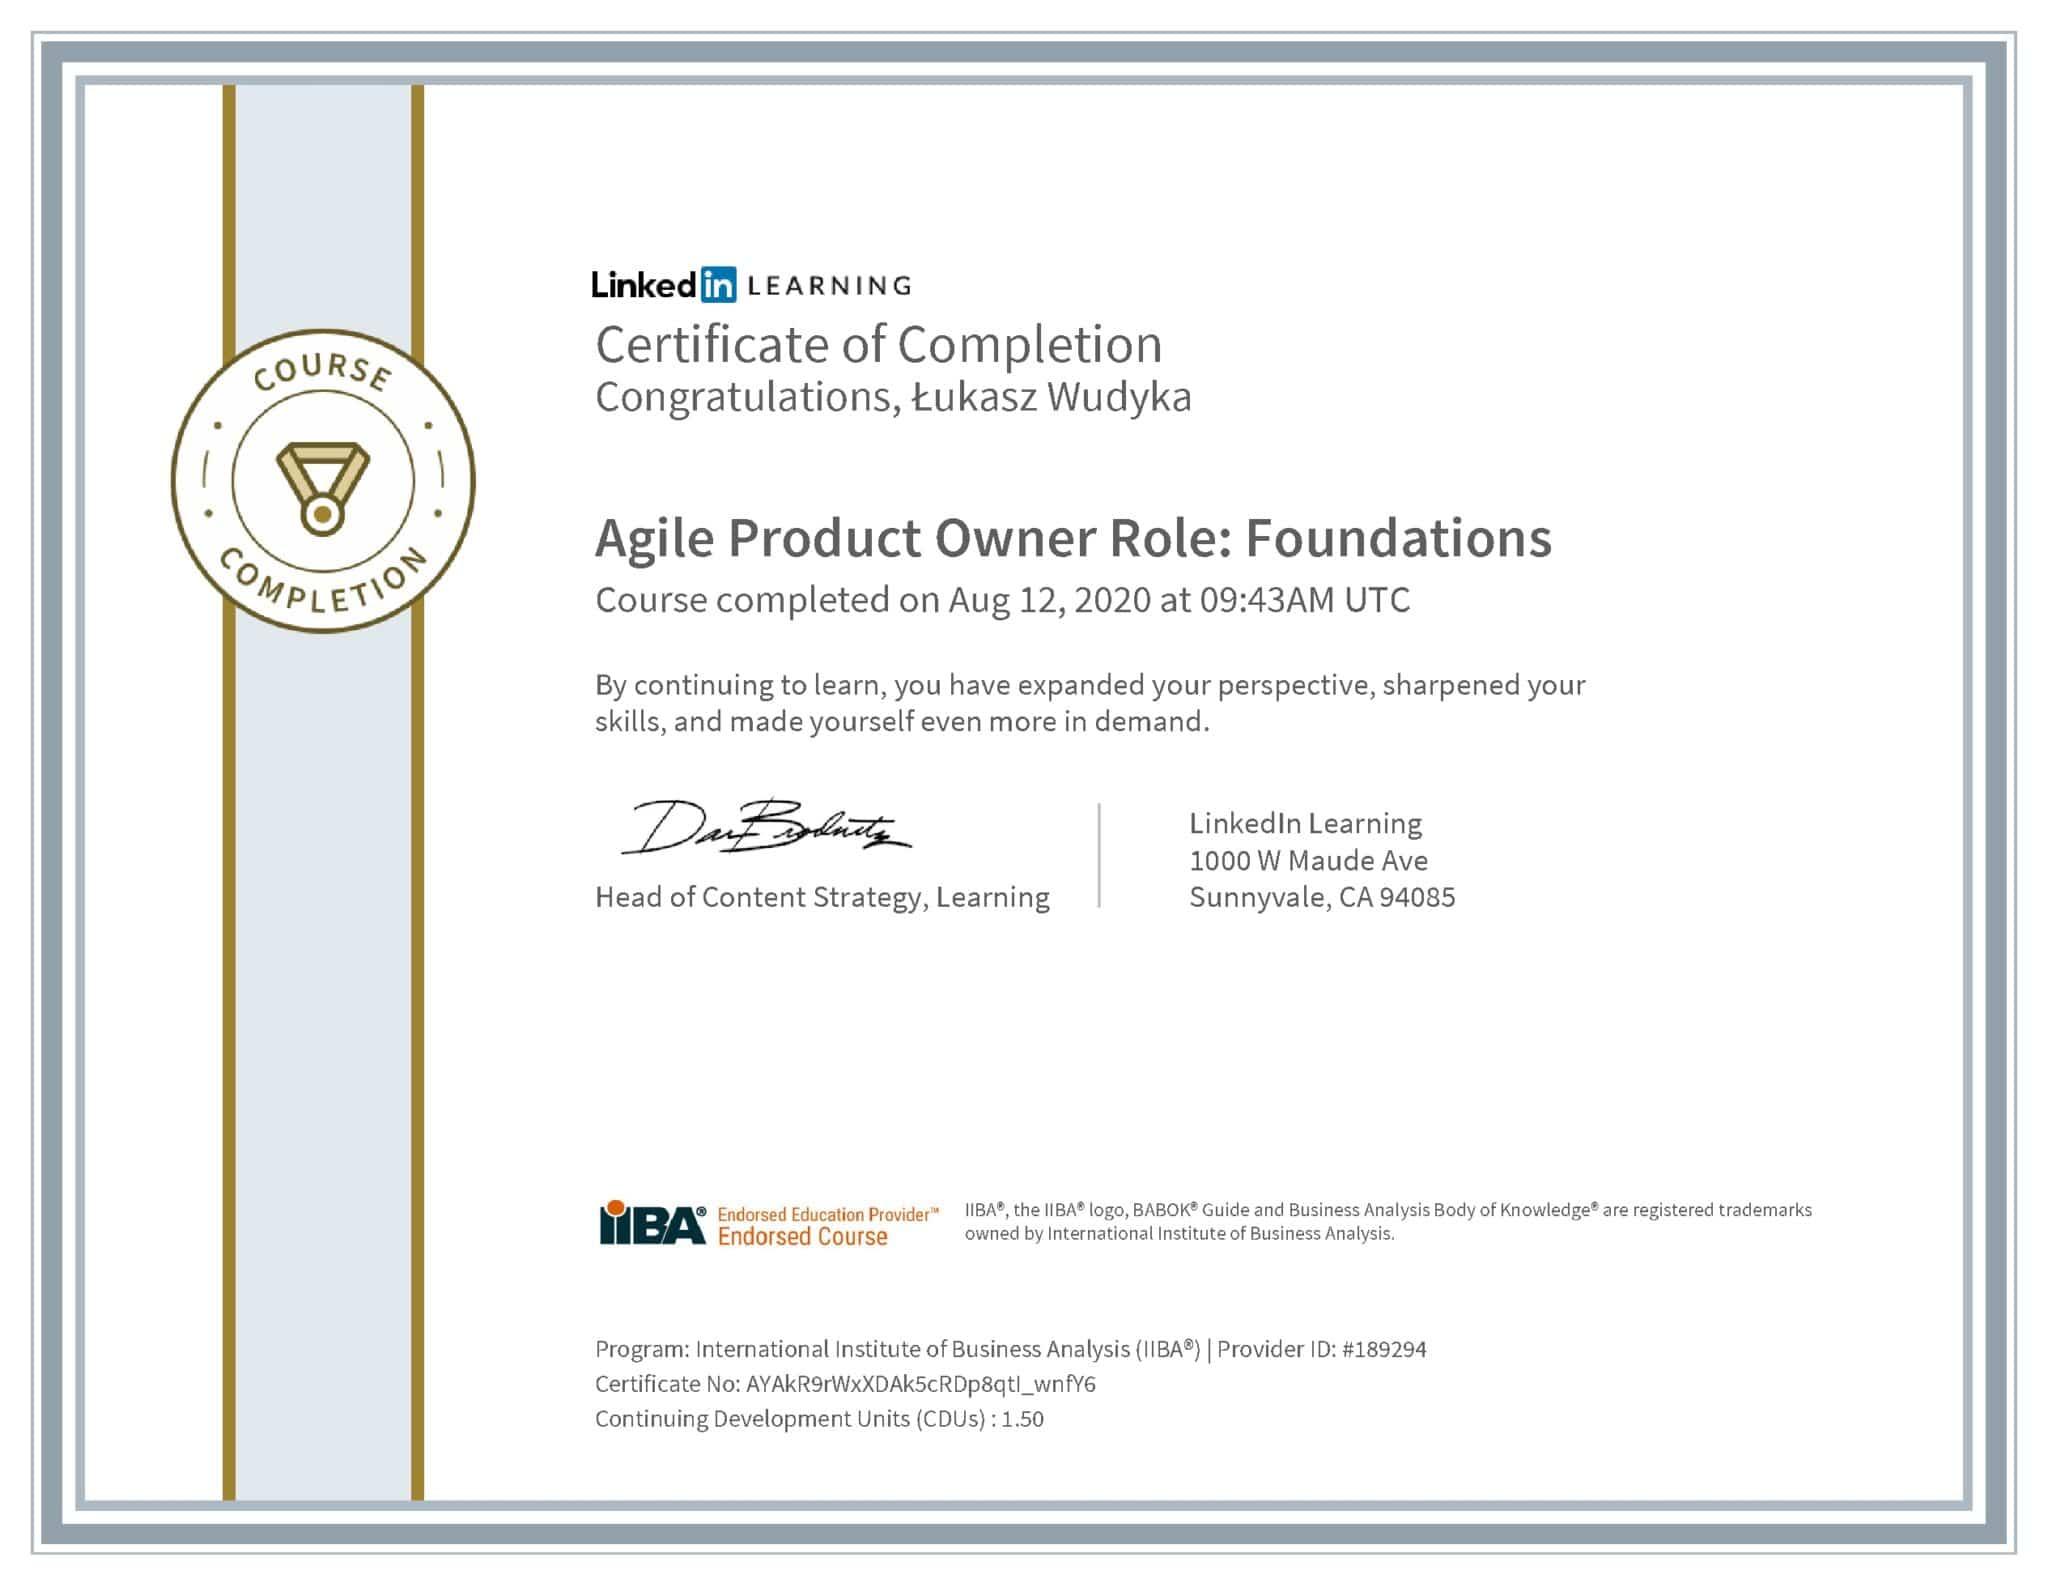 Łukasz Wudyka certyfikat LinkedIn Agile Product Owner Role: Foundations IIBA